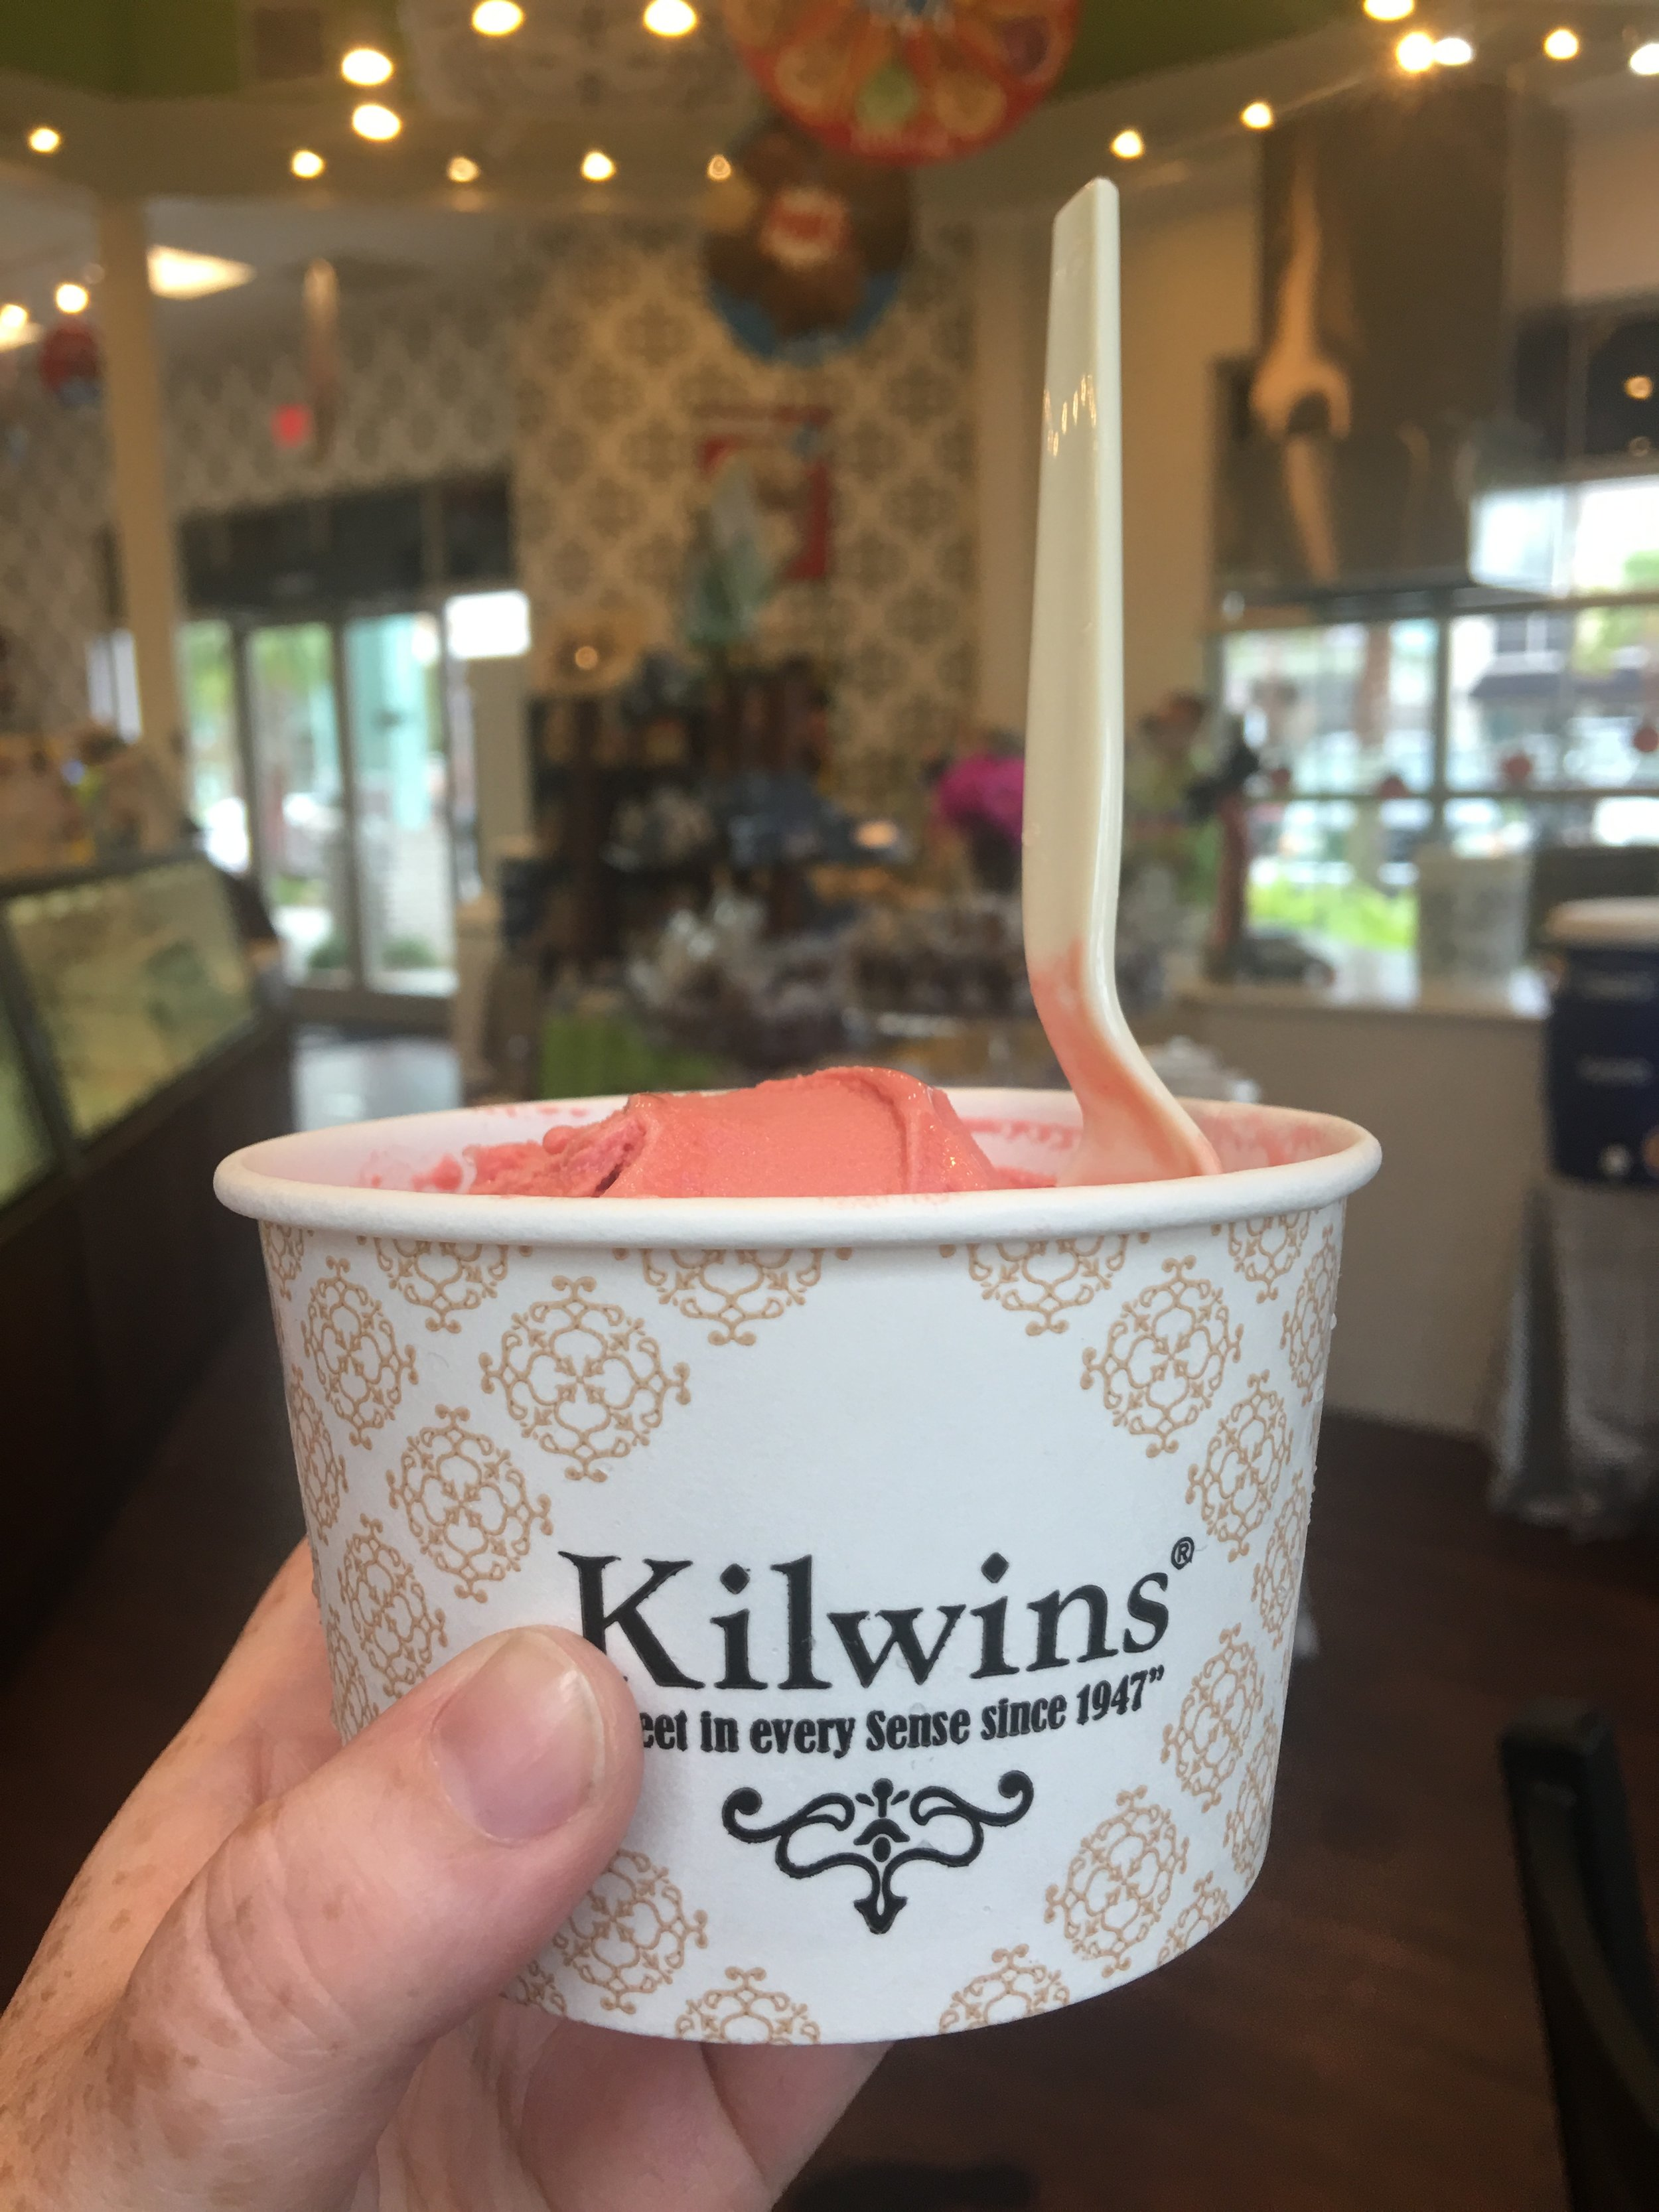 Kilwin's Shelter Cove Hilton Head Island, SC